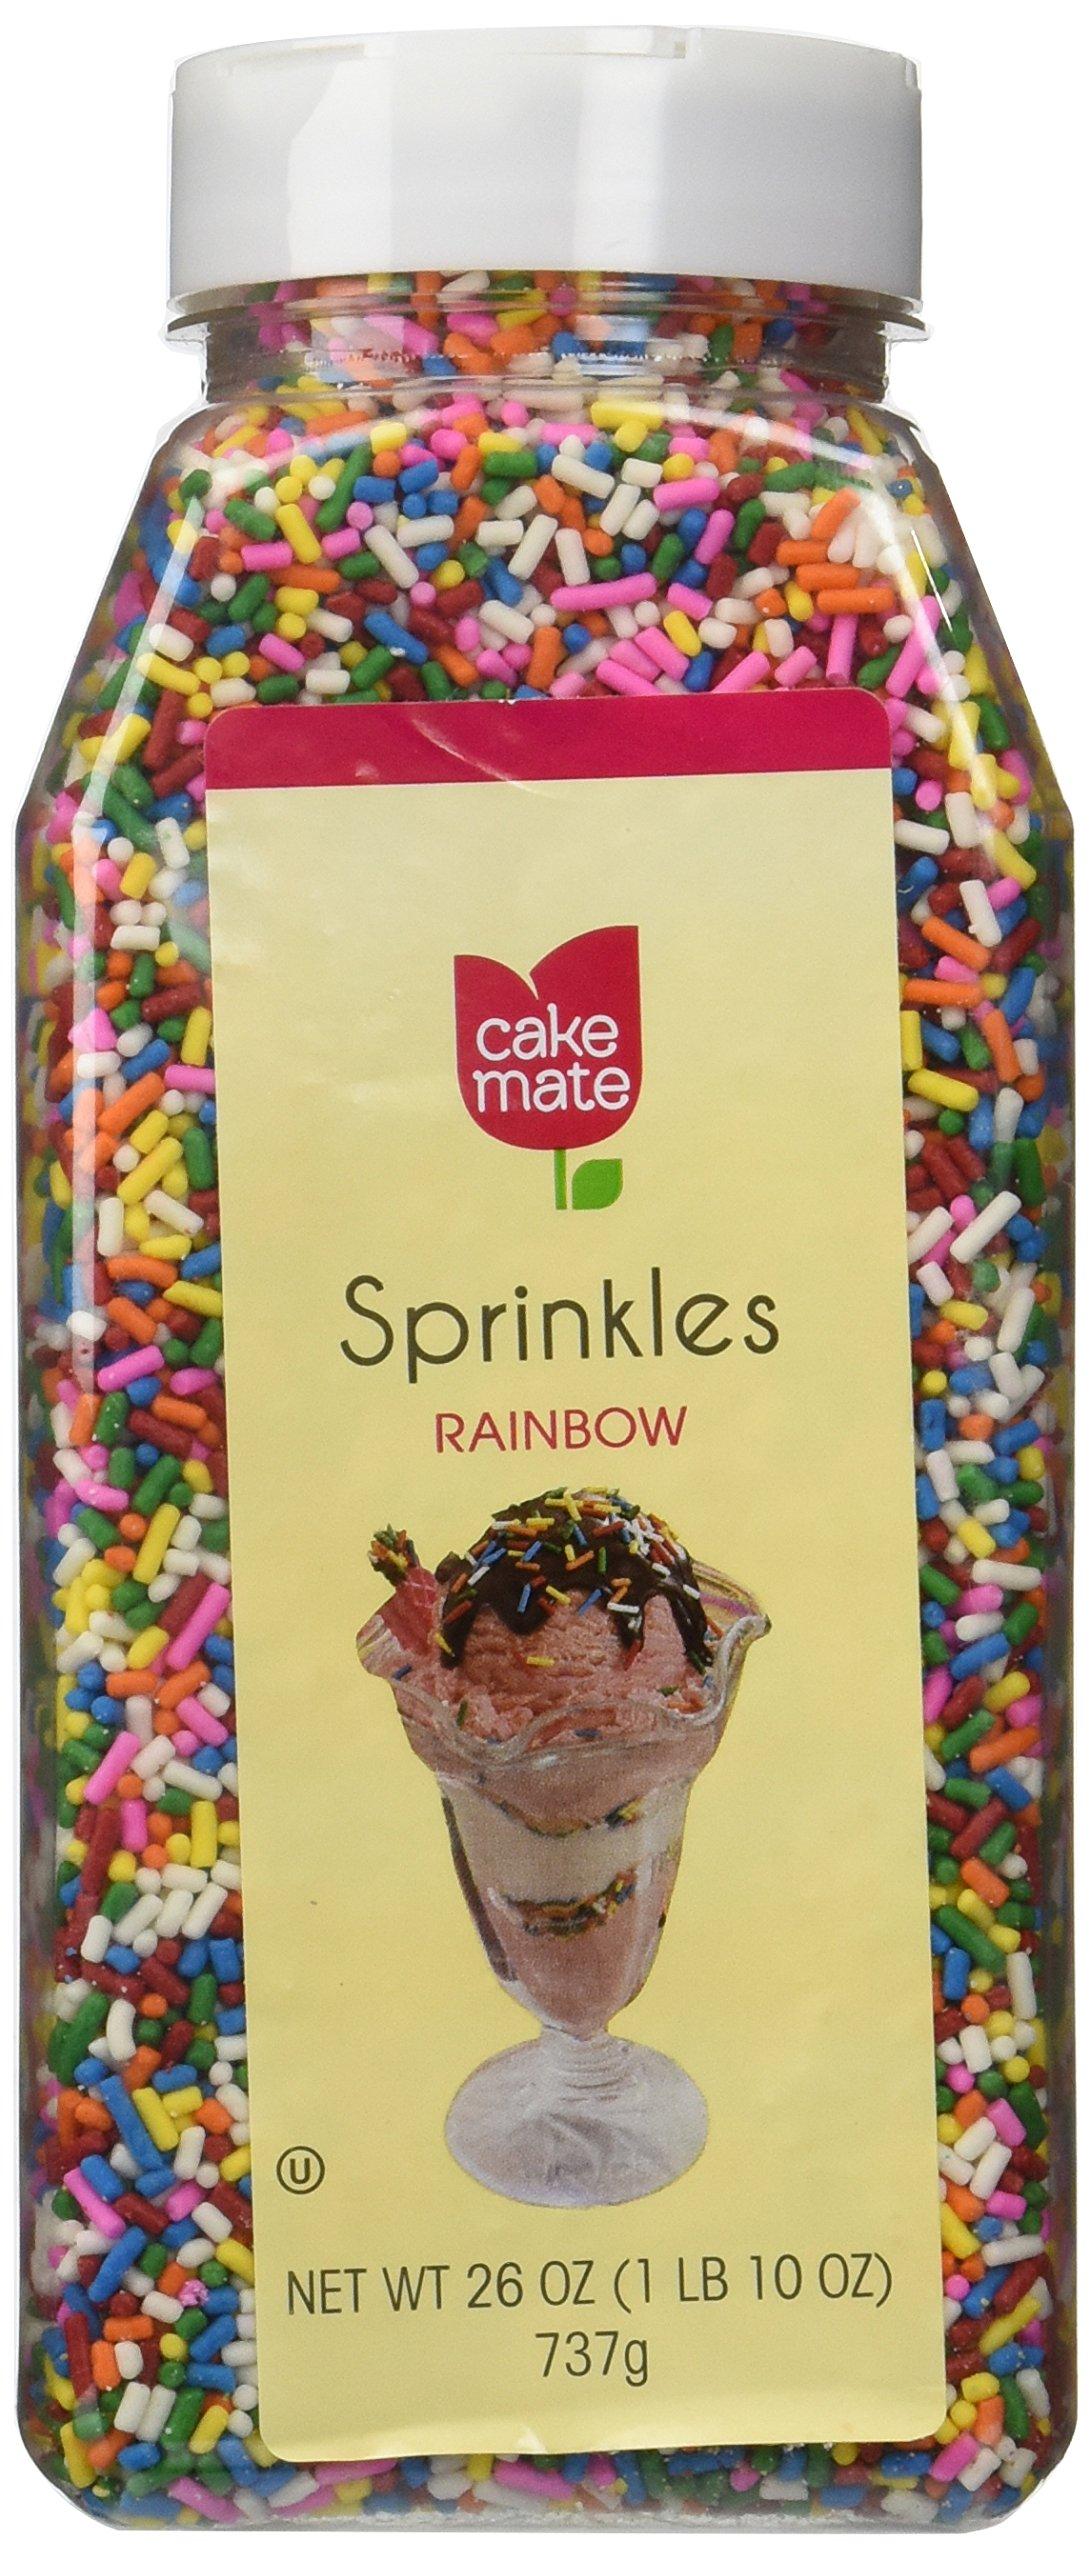 Cake Mate Sprinkles Chocolate Flavored 26 Oz: Amazon.com